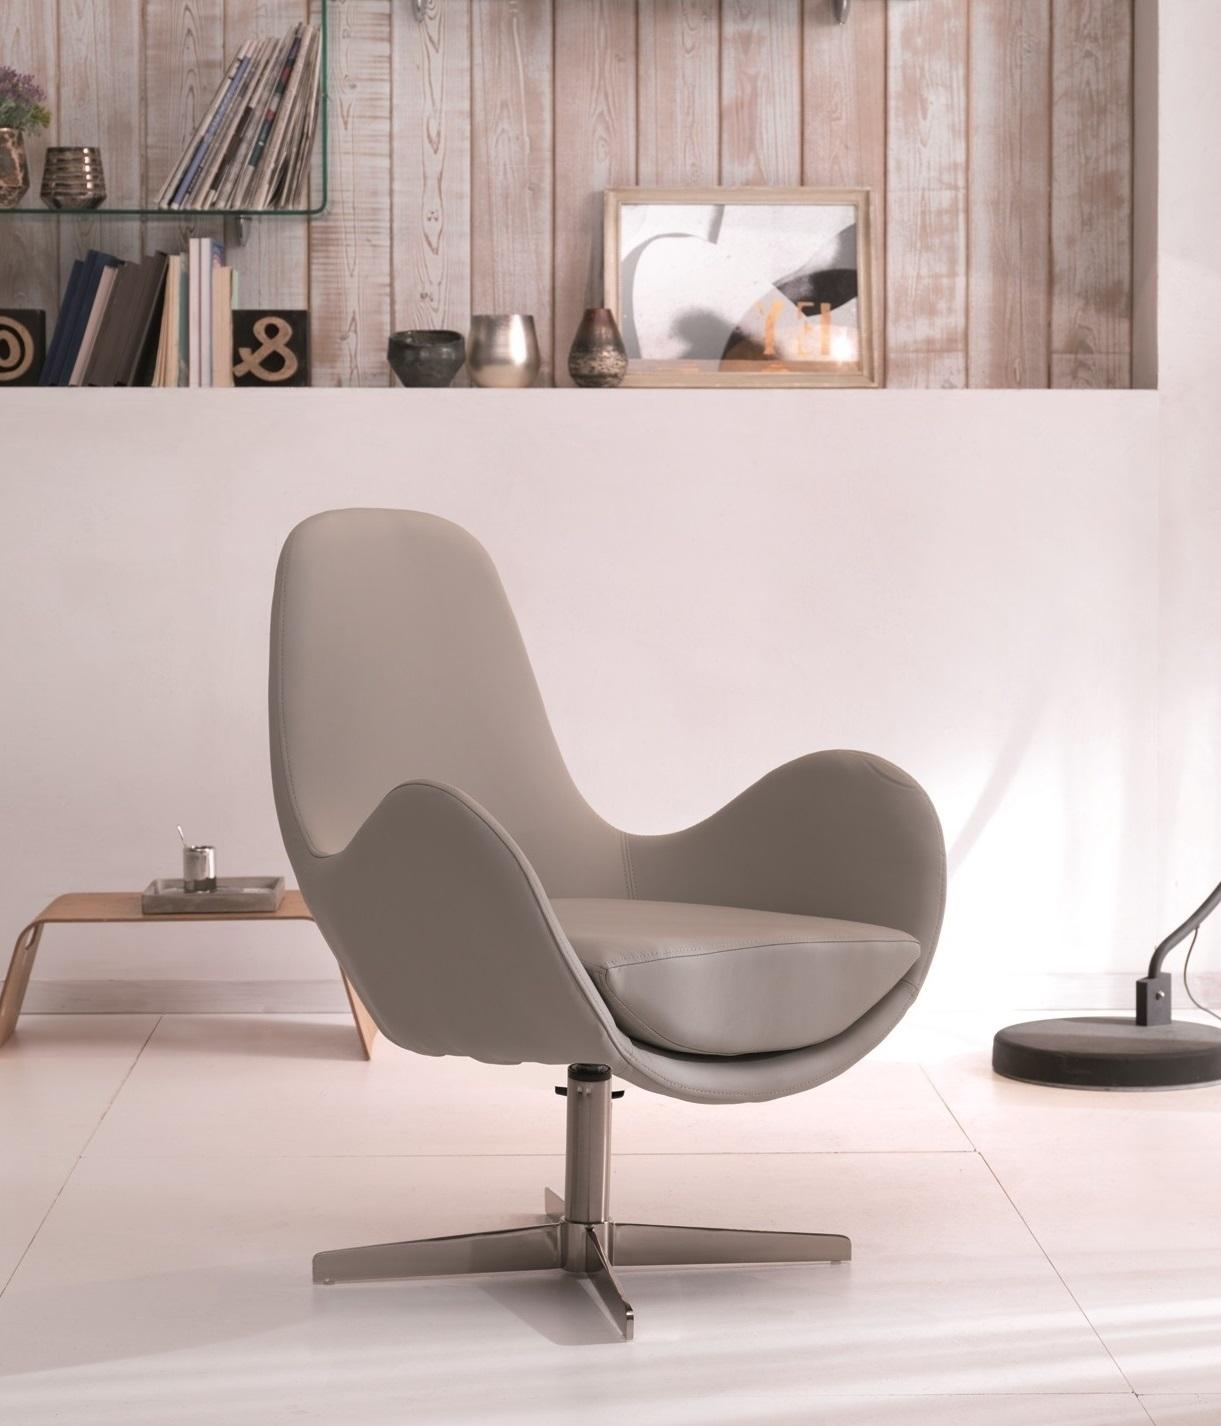 Poltroncina stones modello olga sedie a prezzi scontati for Sedie a poltroncina